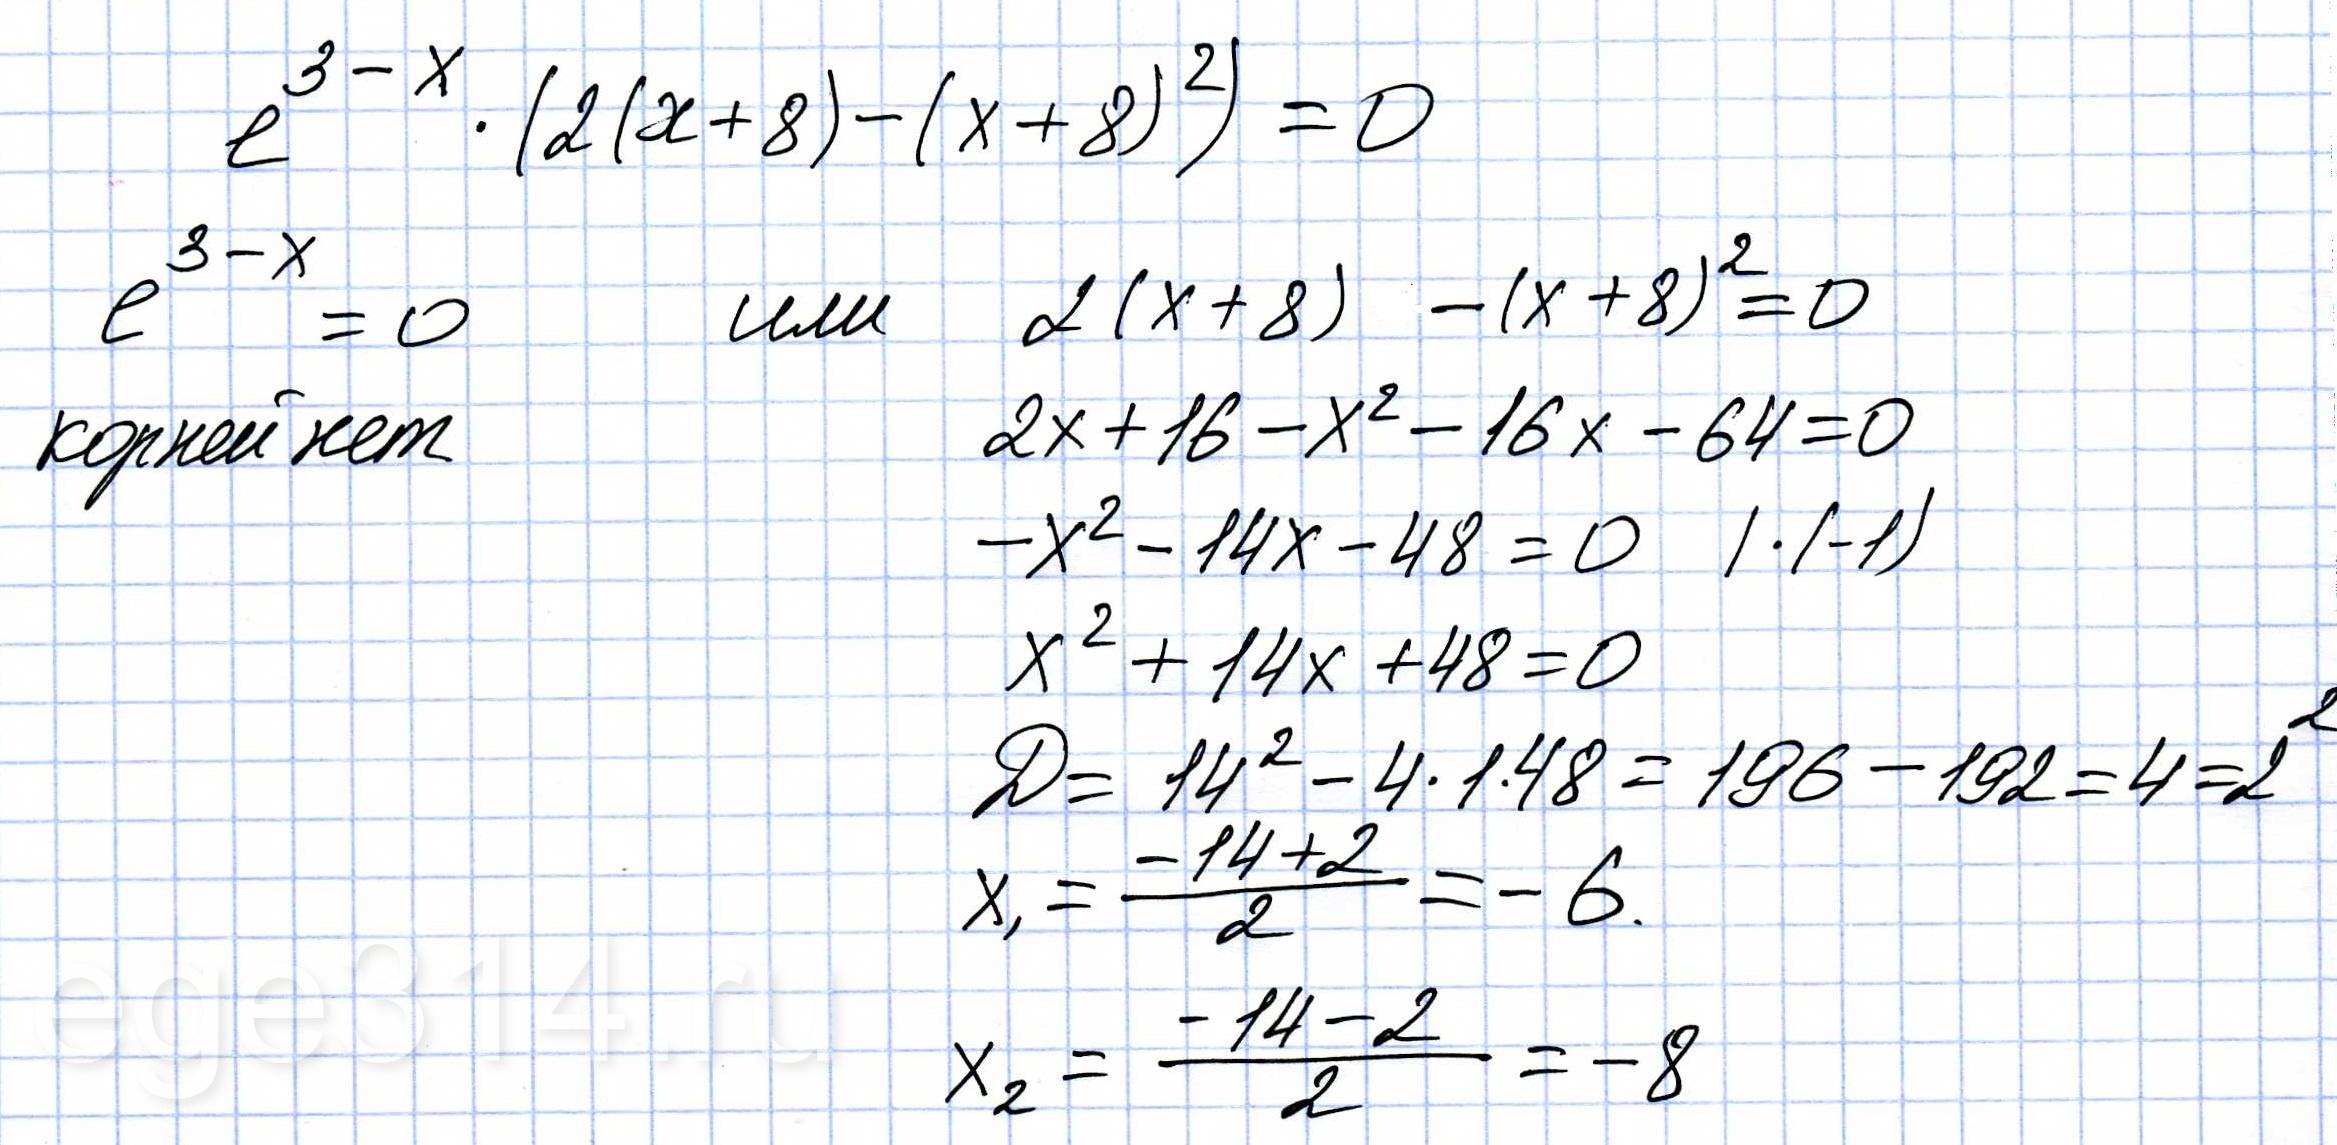 Решение №533 Найдите точку максимума функции y=(x+8)^2 ∙ e^(3-x)